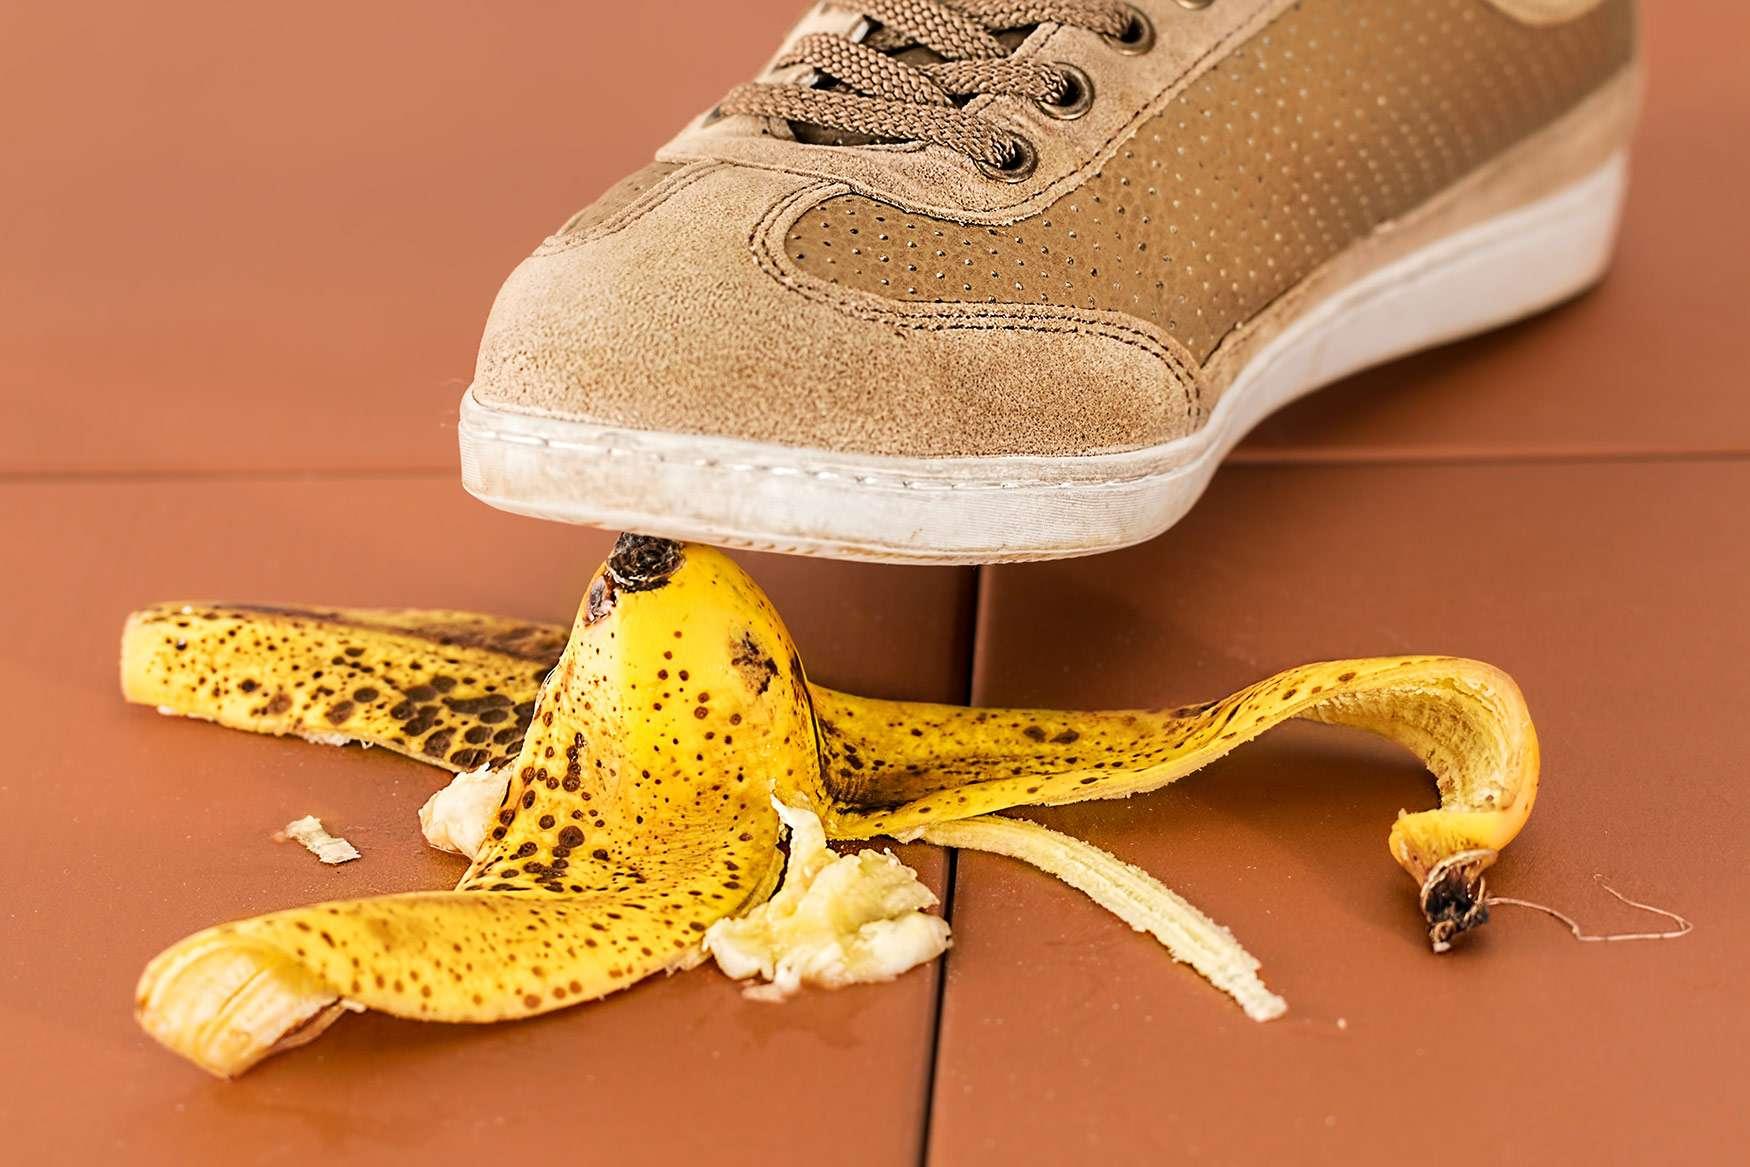 Stepping on a banana